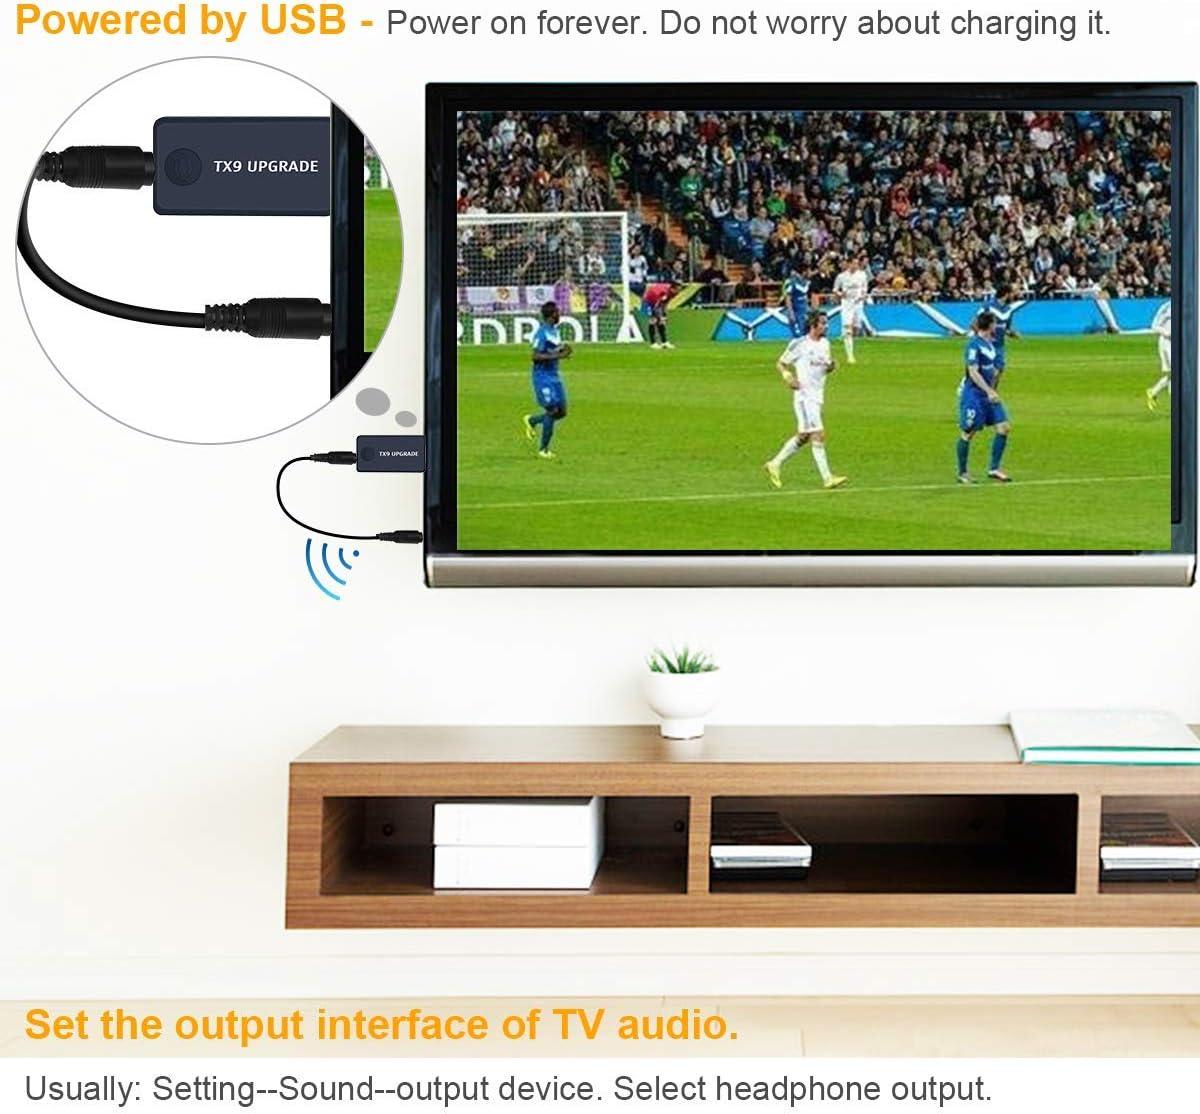 TX9 Transmisor Bluetooth para TV, PC (soporta 3.5mm, RCA, USB Audio de PC) Conexión Dual Adaptador Inalámbrico de Audio para Auriculares, Baja Latencia, Alta Fidelidad Estéreo, Plug and Play: Amazon.es: Electrónica